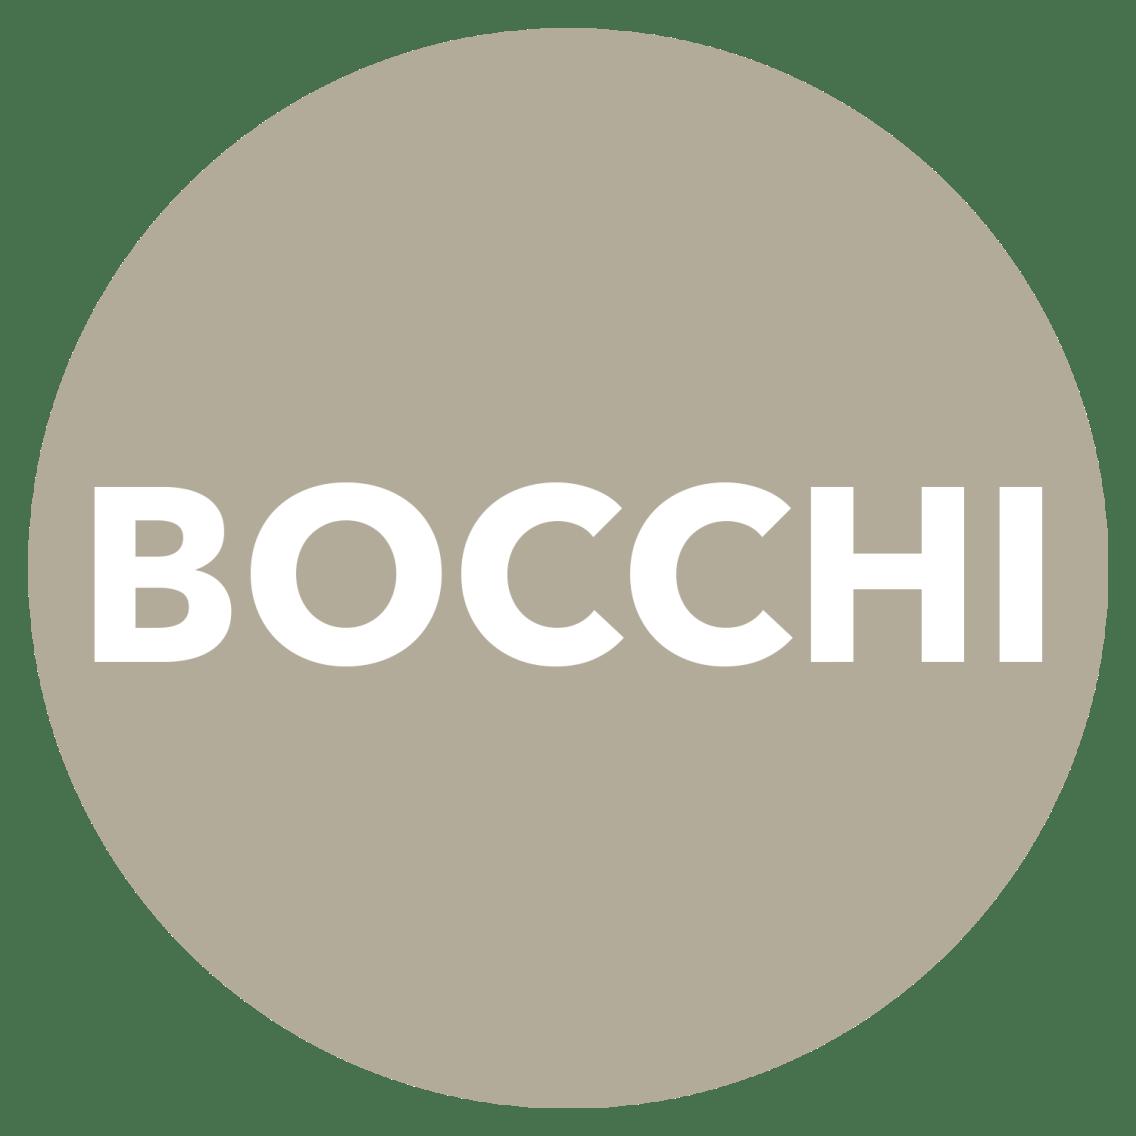 aya-kapadokya-room-features-amenities-icon-bocchi